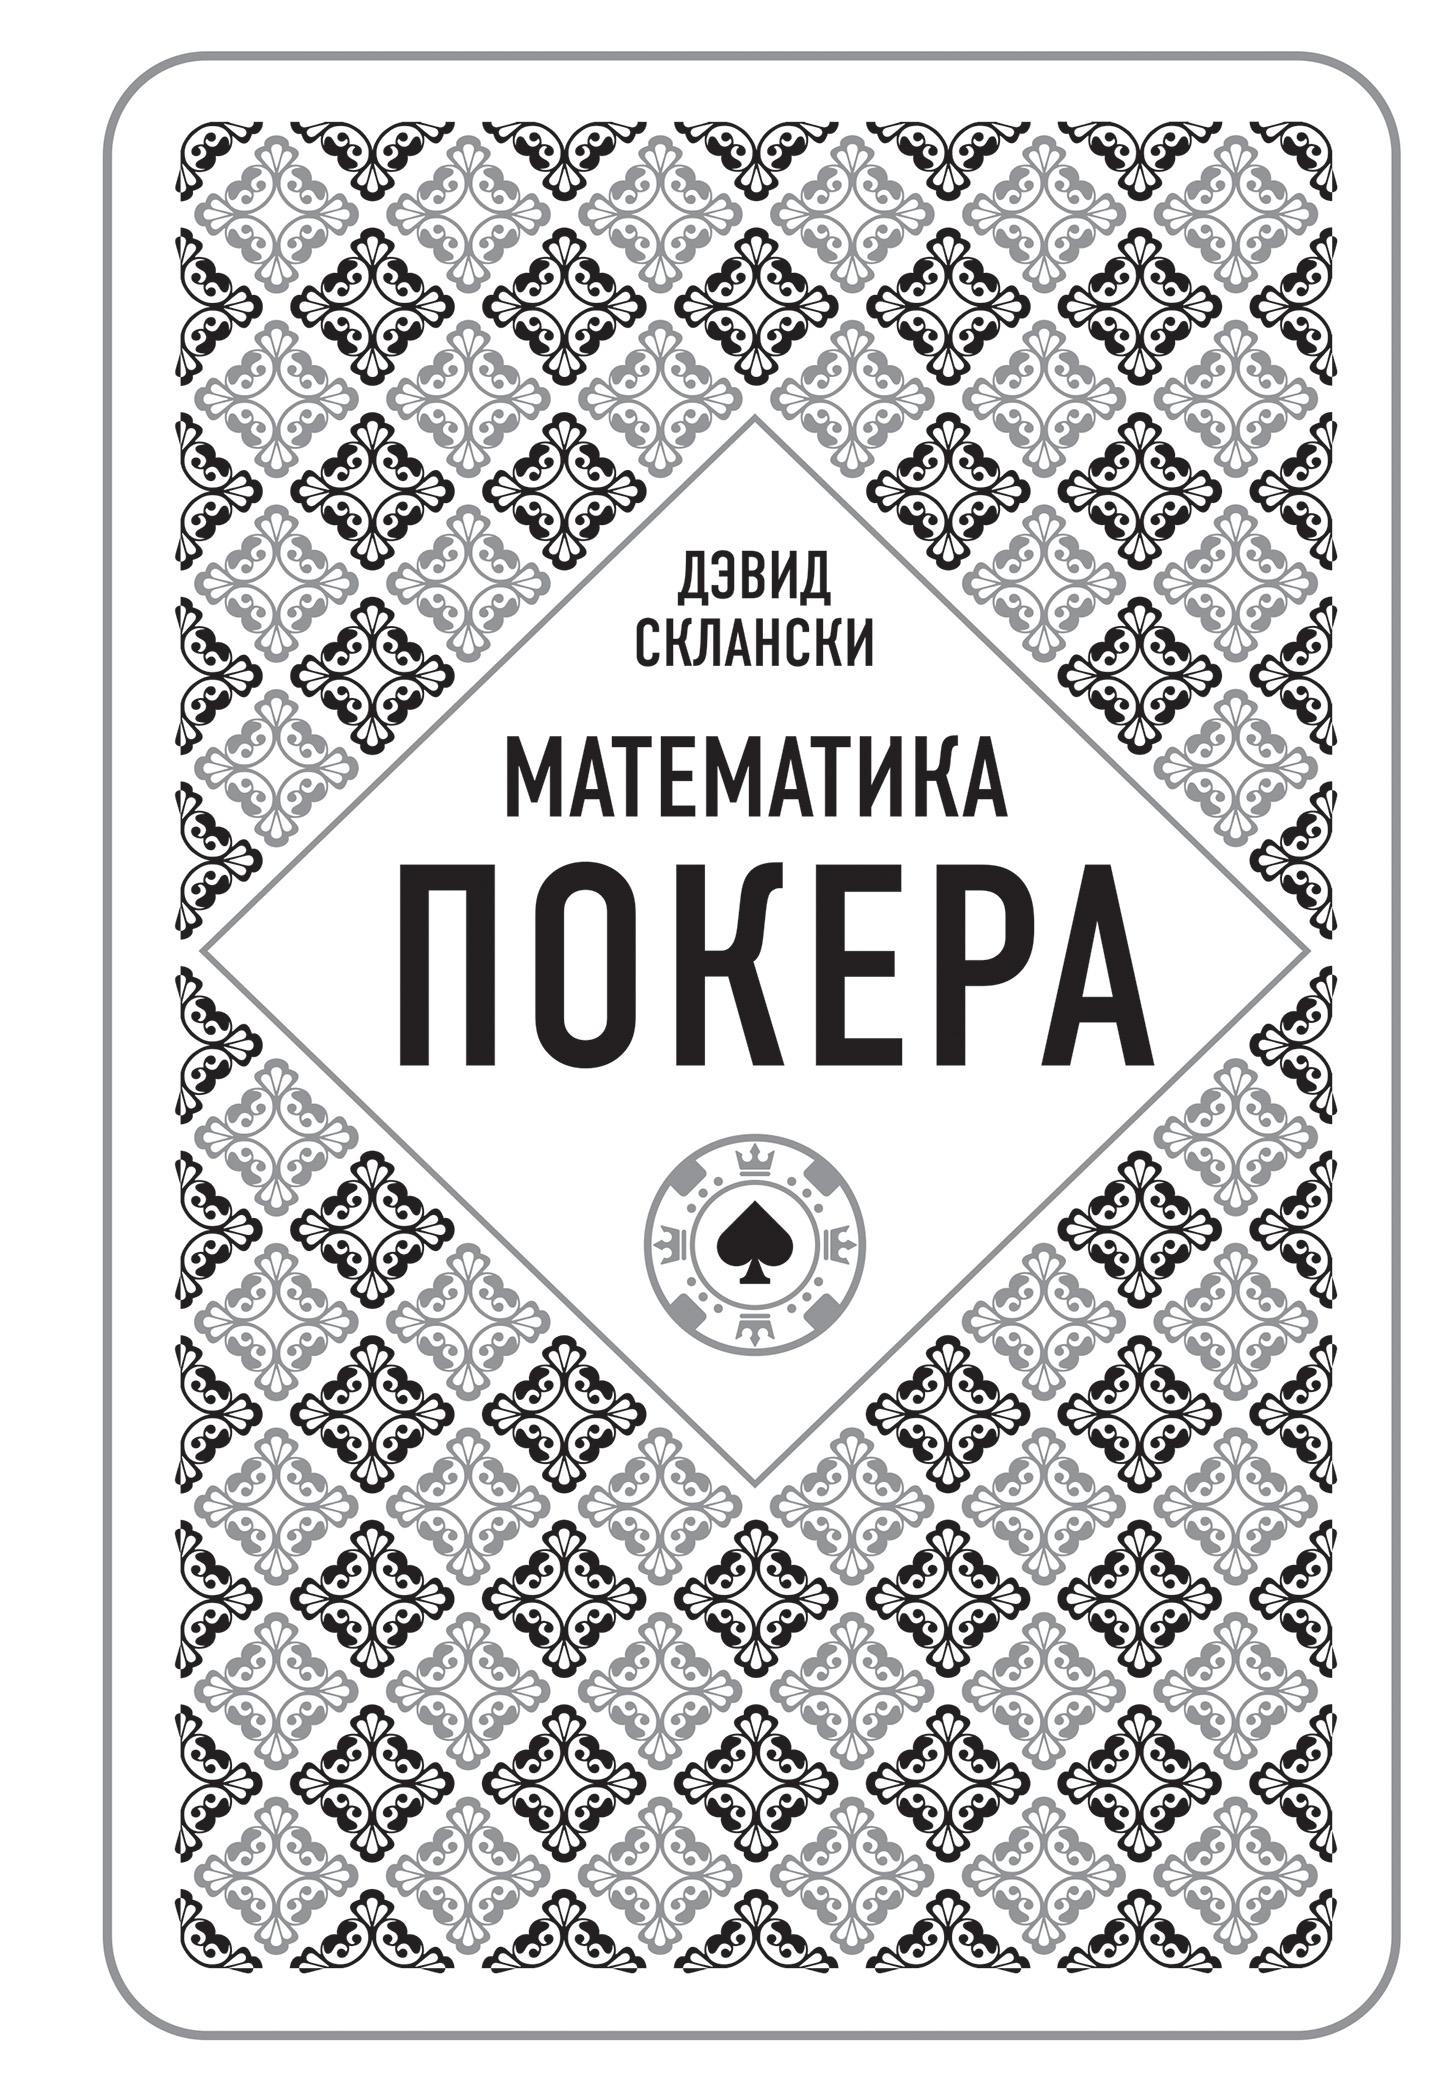 Склански Дэвид Математика покера от профессионала